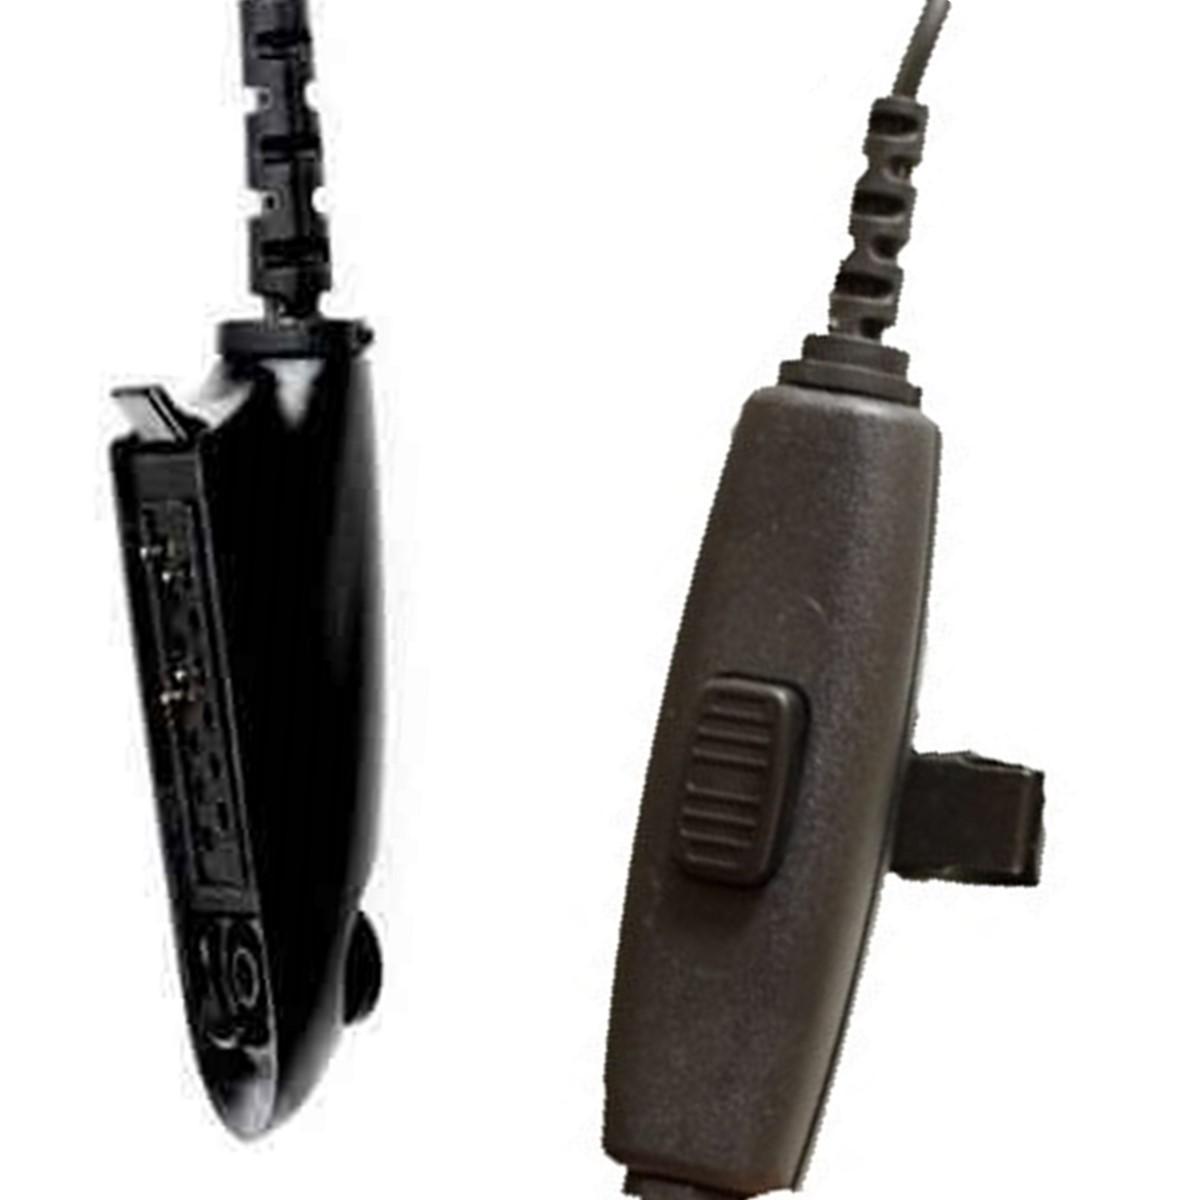 Auricular Motorola manos libres ENMN4012 tipo operador